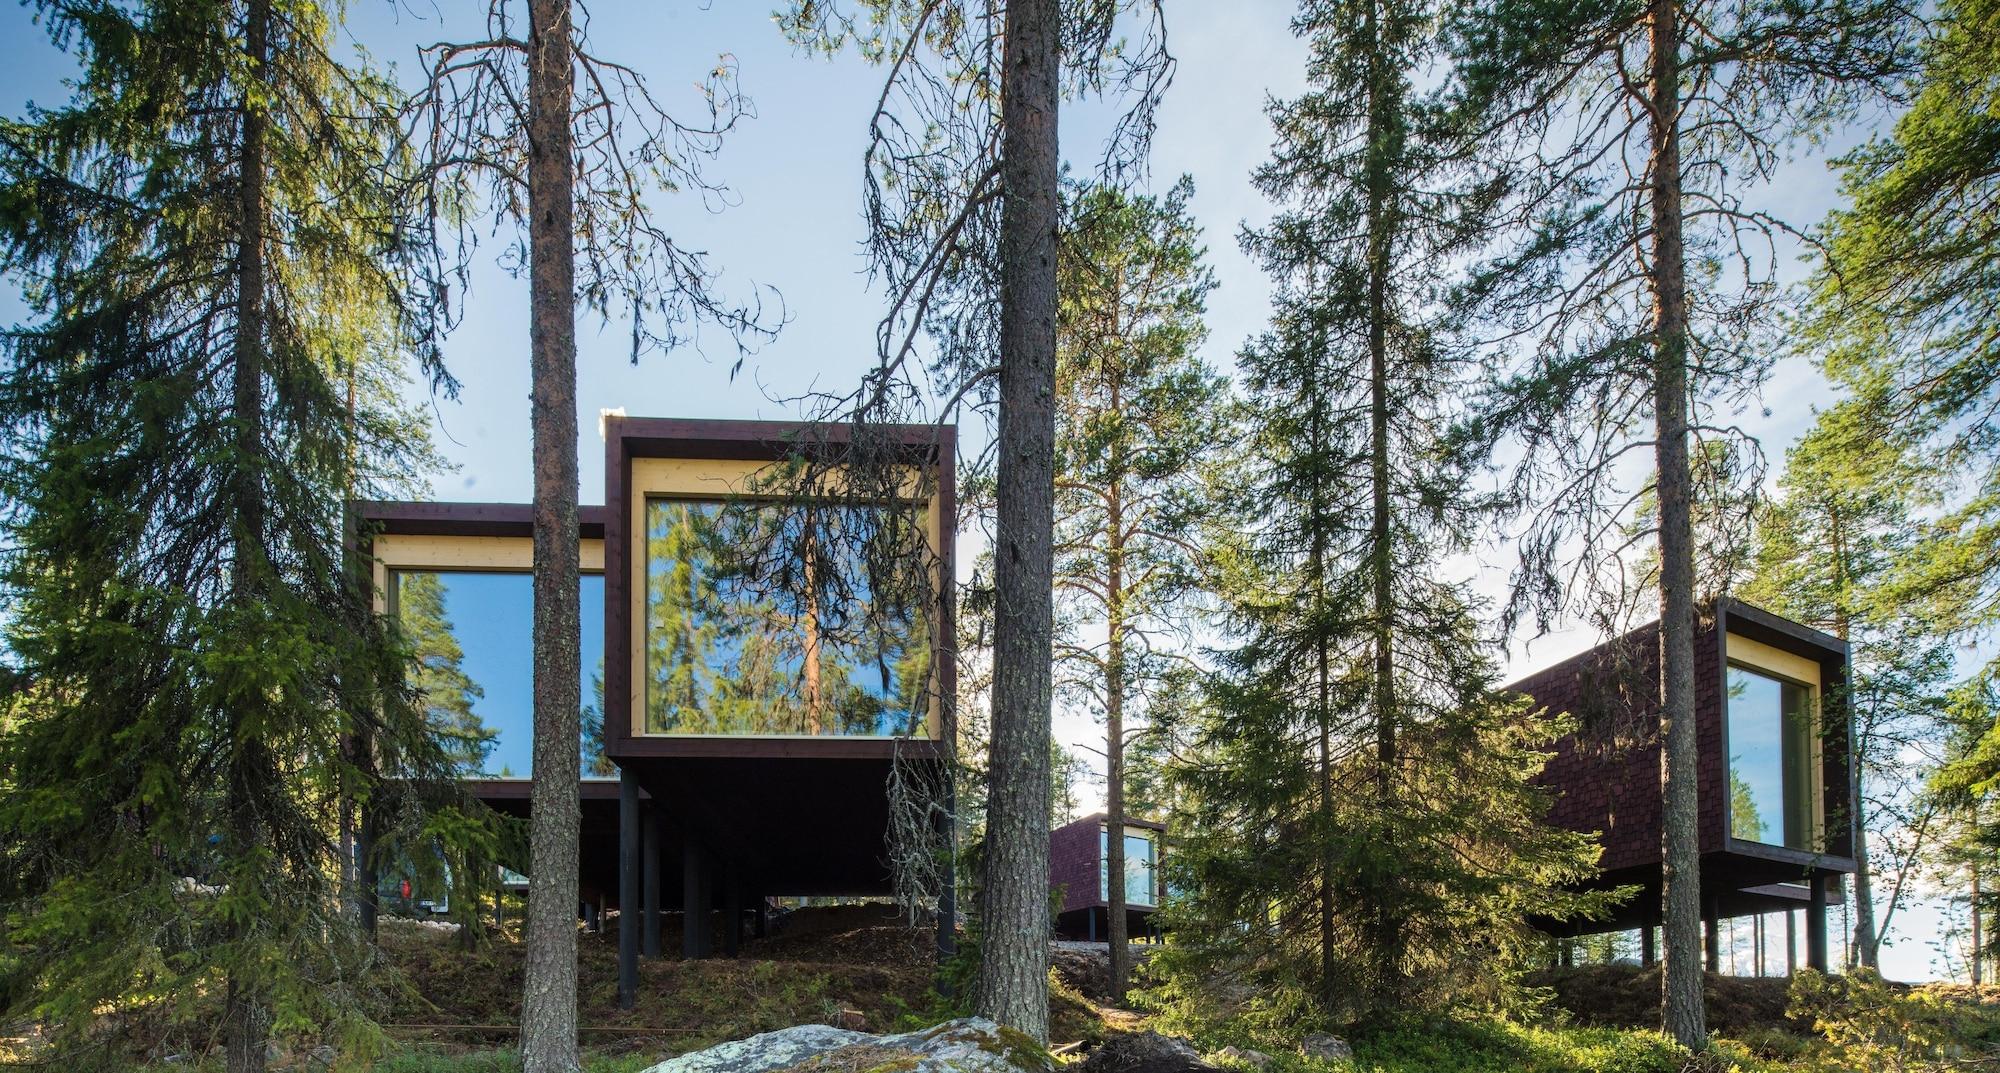 Arctic TreeHouse Hotel, Lapland